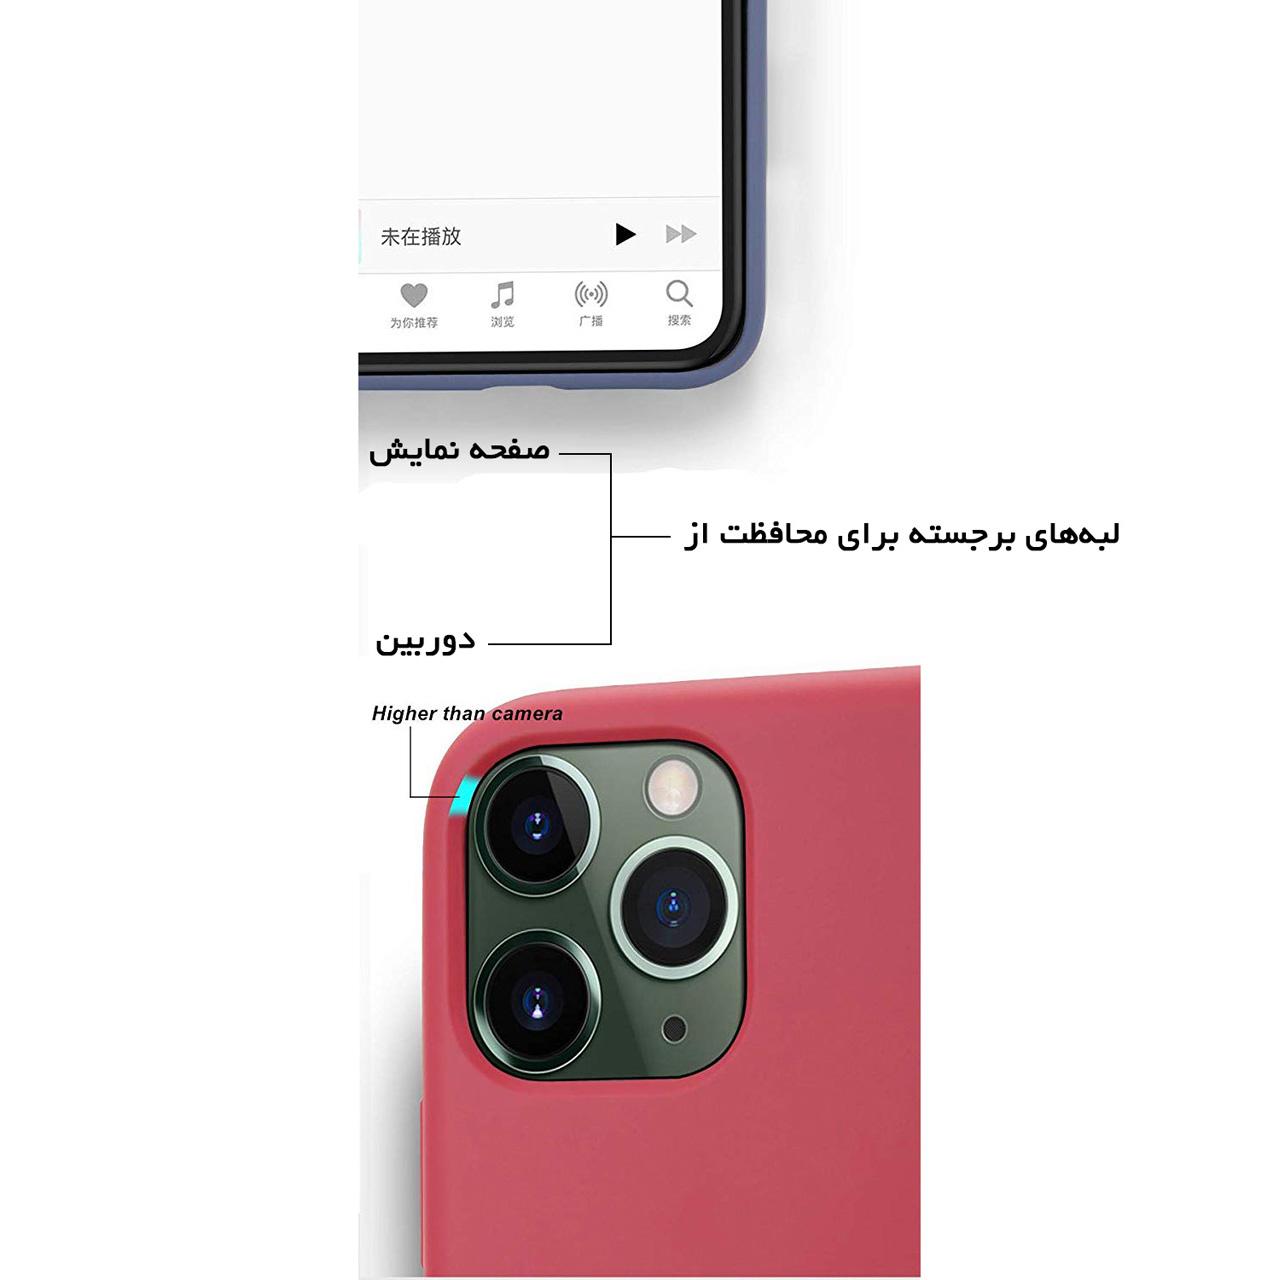 کاور وی کیس مدل Si01 مناسب برای گوشی موبایل اپل iPhone 11 Pro Max main 1 6